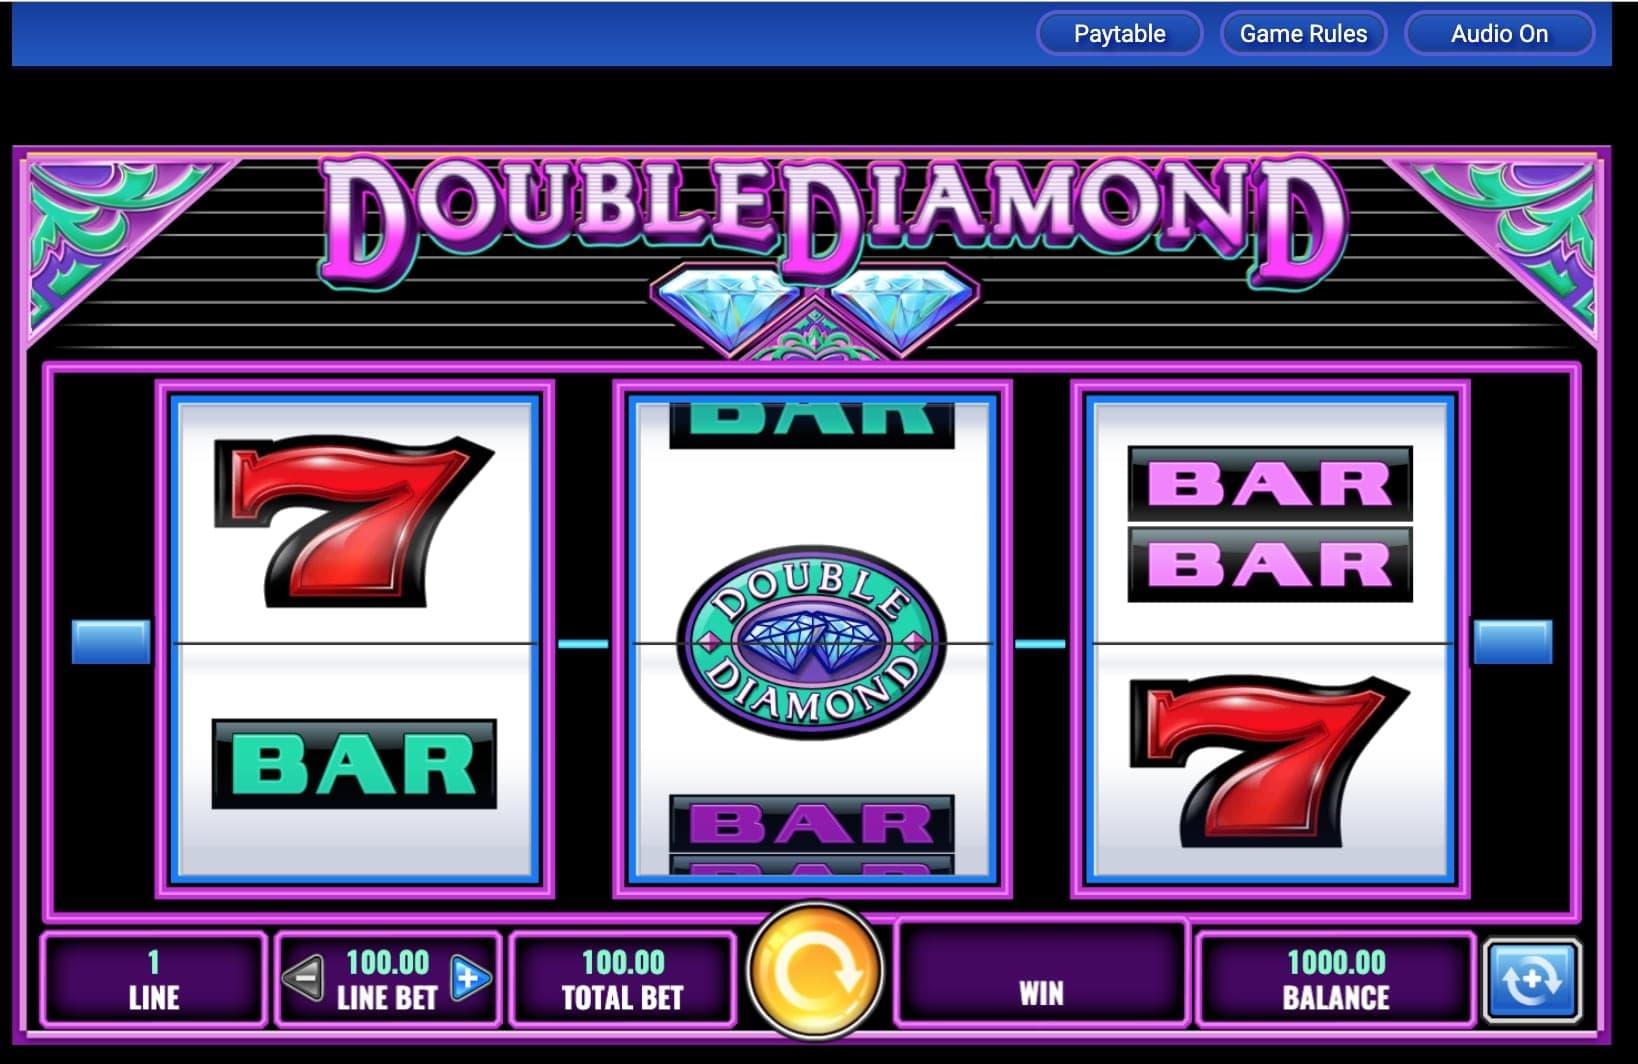 Free Double Diamond Slot Games